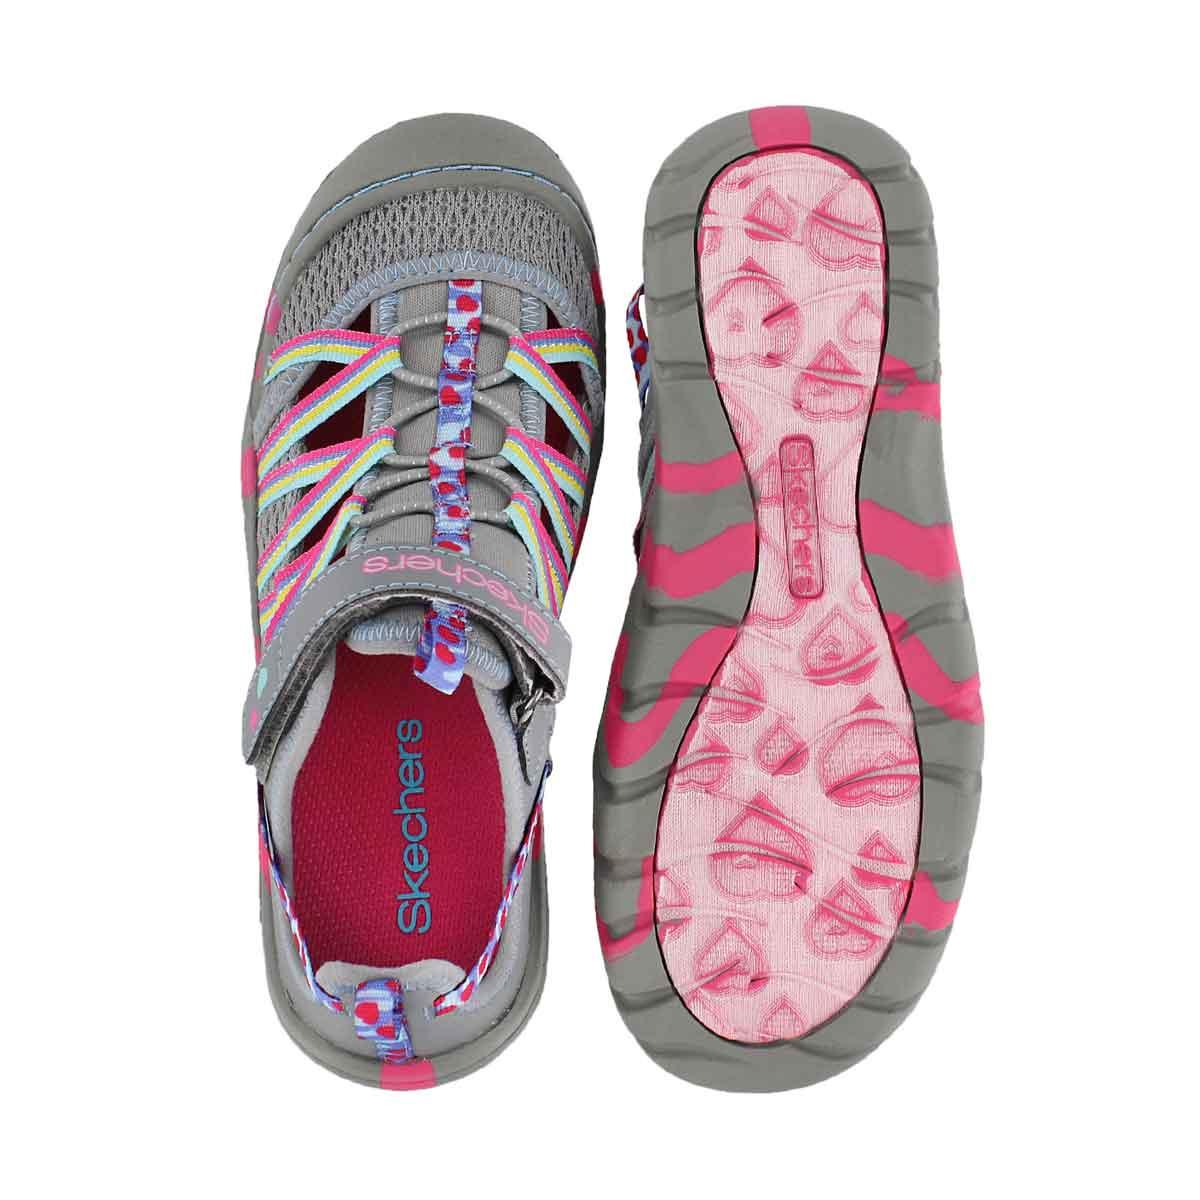 Grls Summer Steps gry/mlt sport sandal